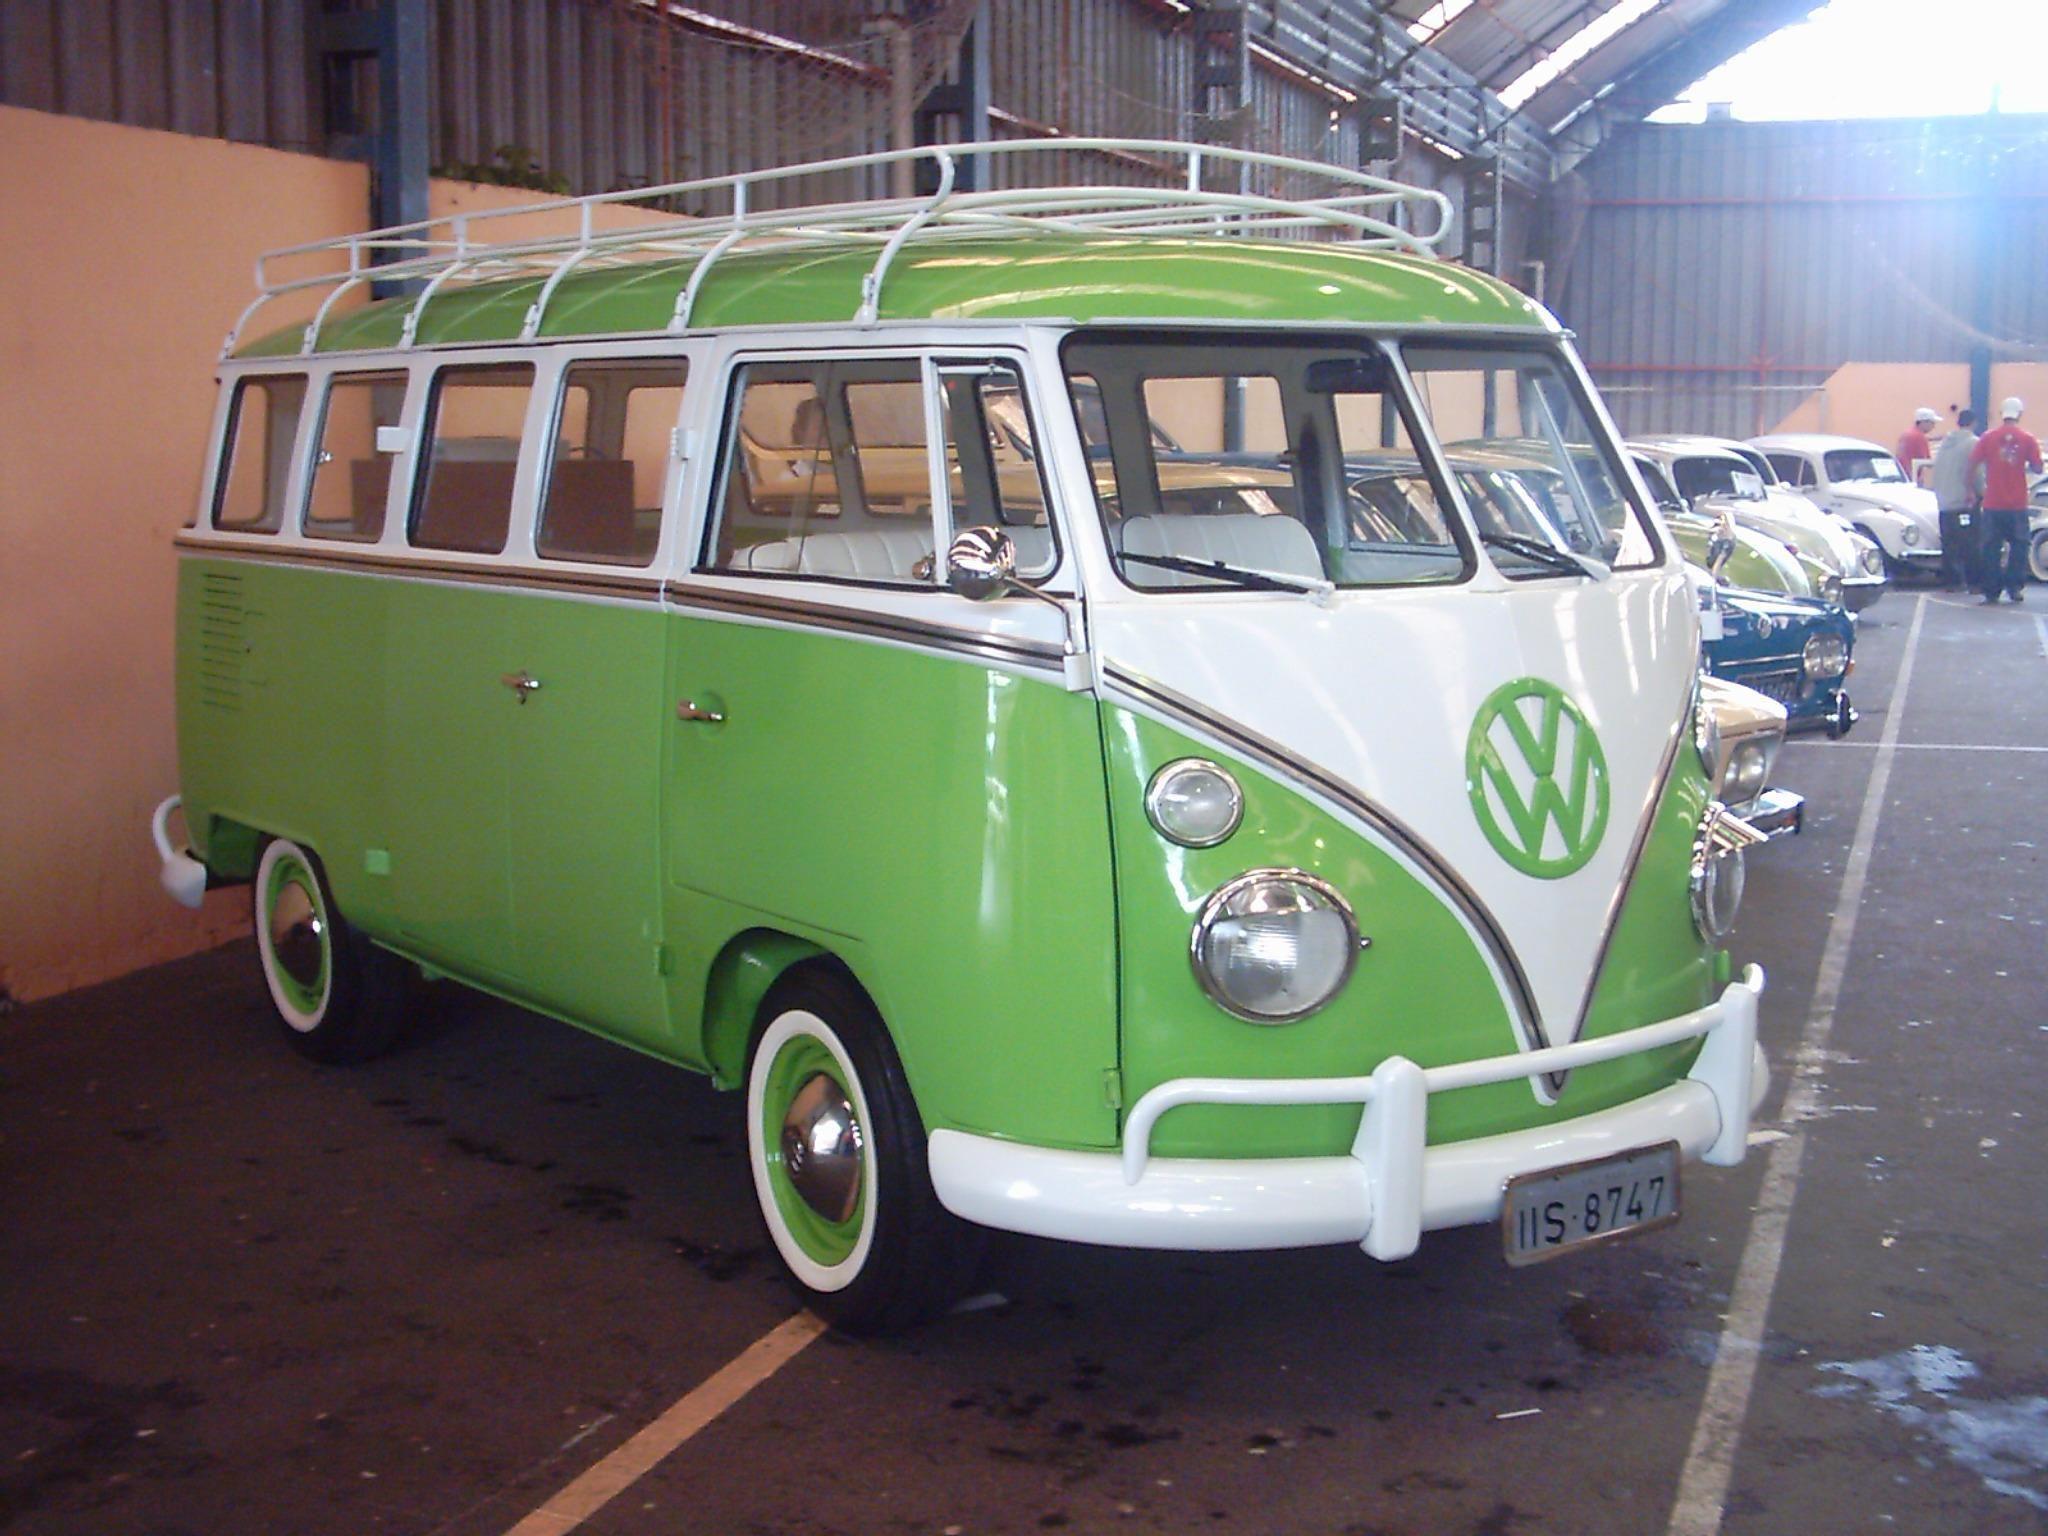 Volkswagen Kombi - Vintage | Cars | Pinterest | Vw, Vw bus and ...